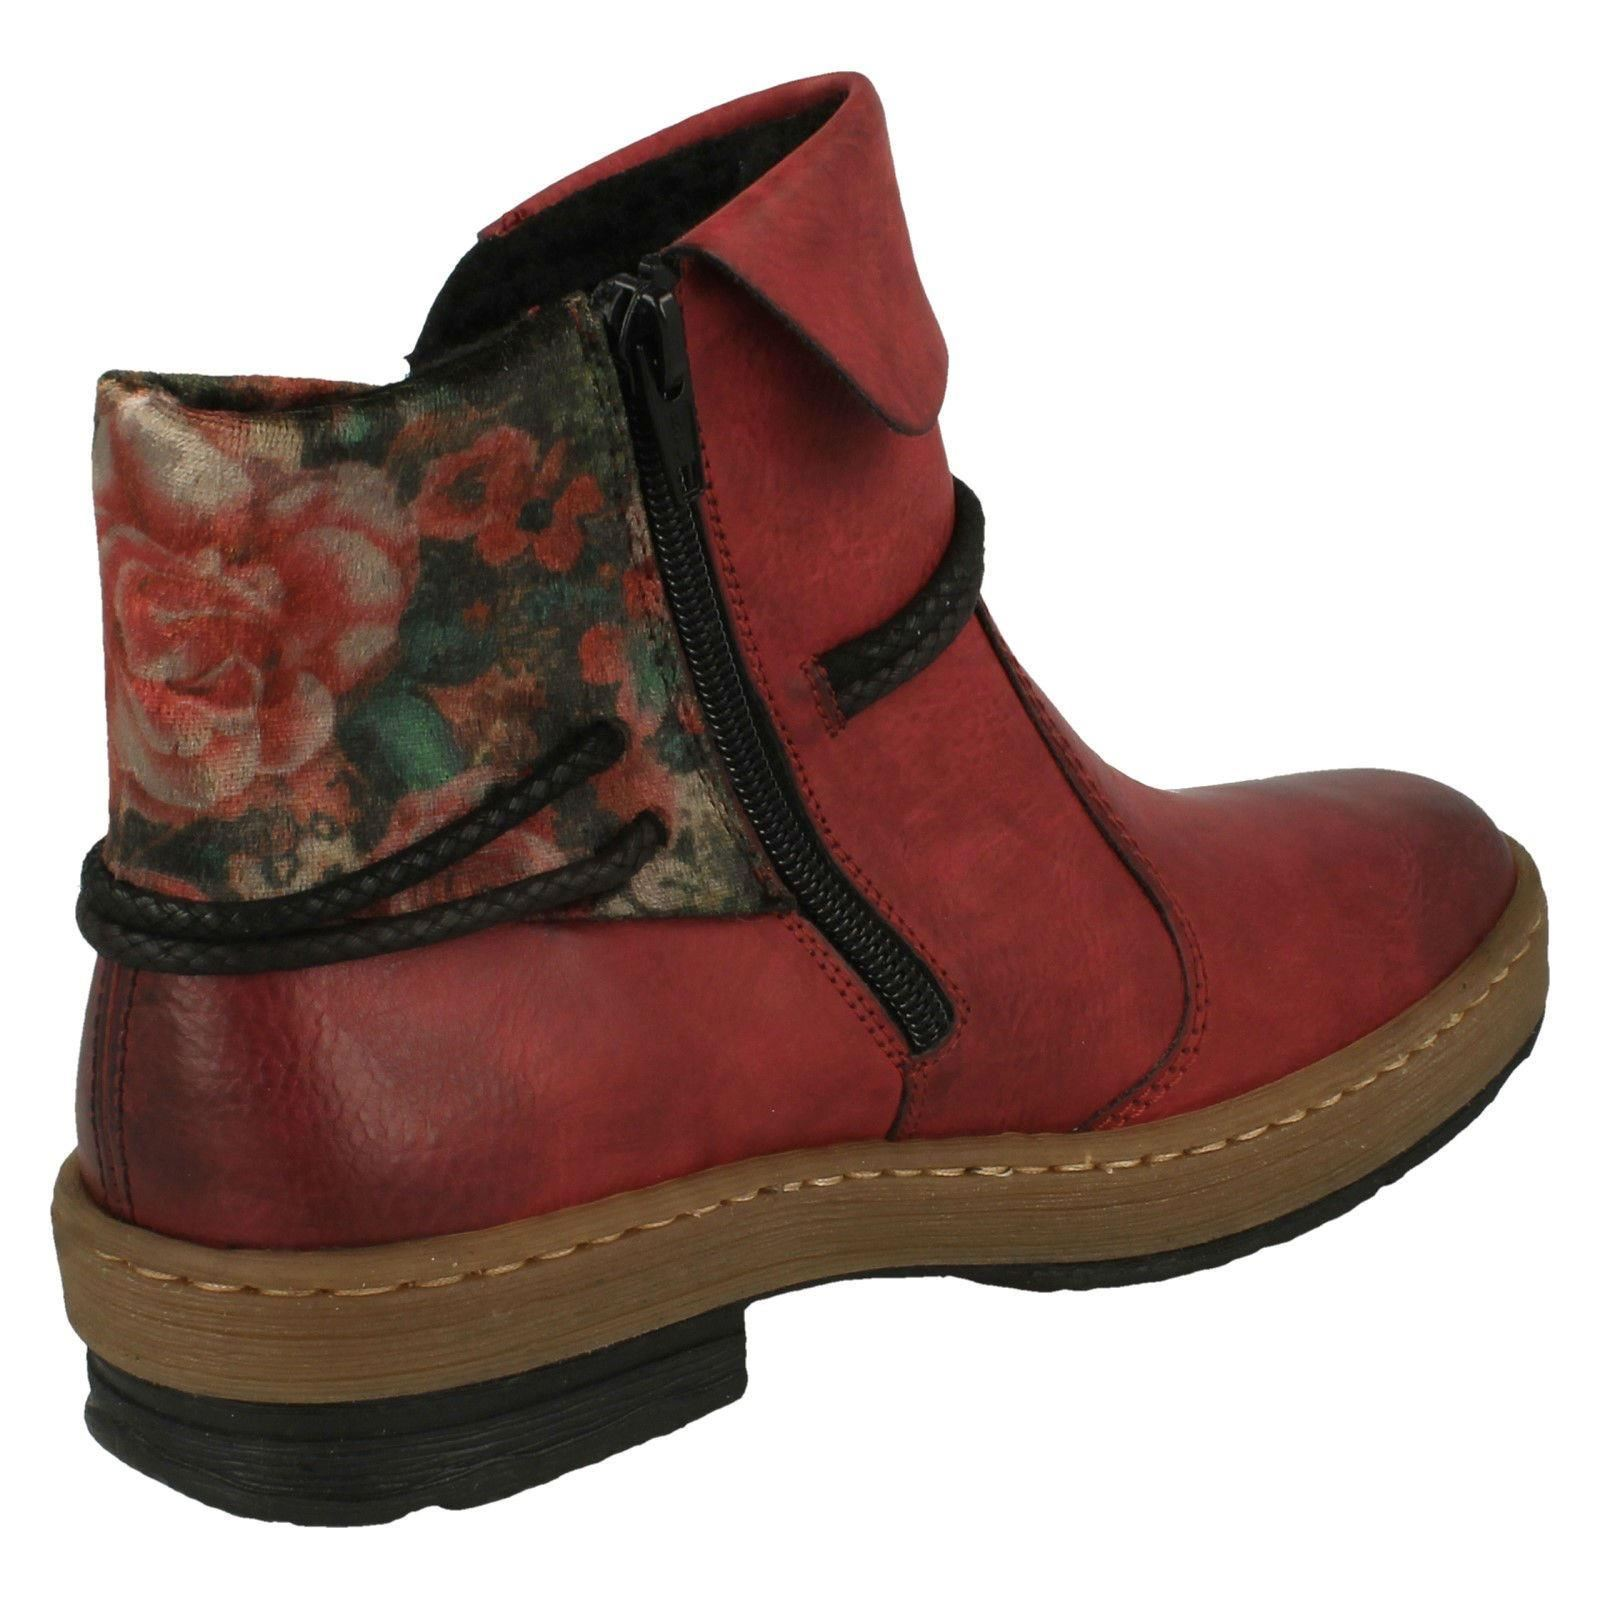 'Ladies Rieker' Rieker' Rieker' Casual Ankle Boots - Z6771 68b2d2